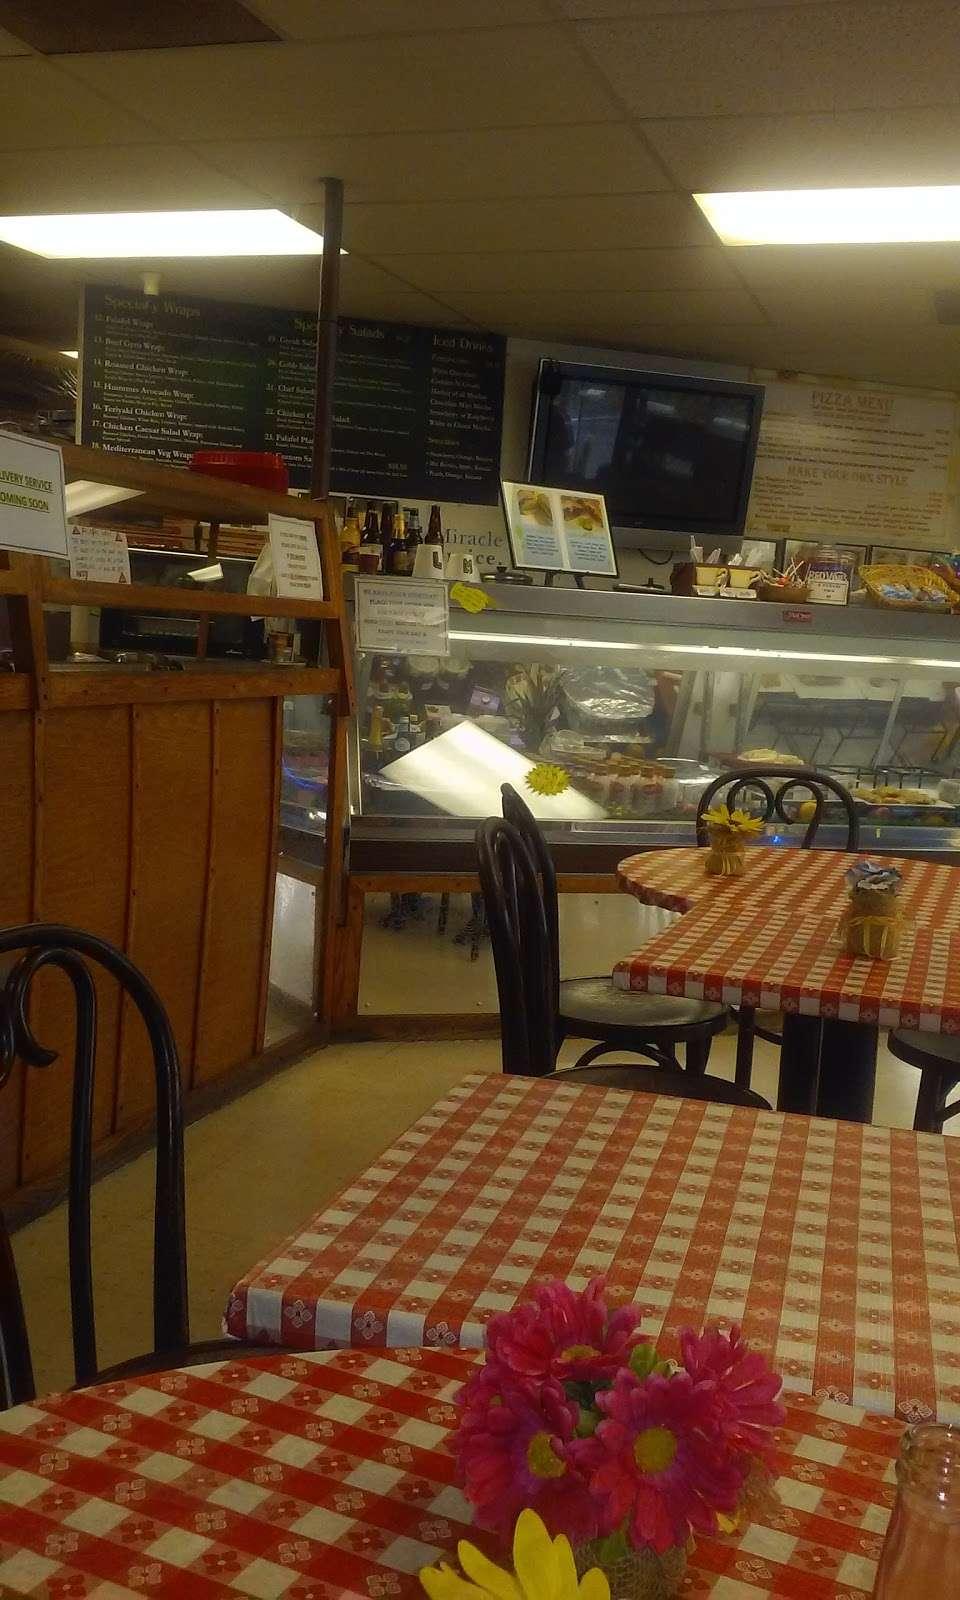 Sams Mediterranean Cafe & Deli - store  | Photo 7 of 10 | Address: 2000, 613 Martin Ave #111, Rohnert Park, CA 94928, USA | Phone: (707) 584-0220